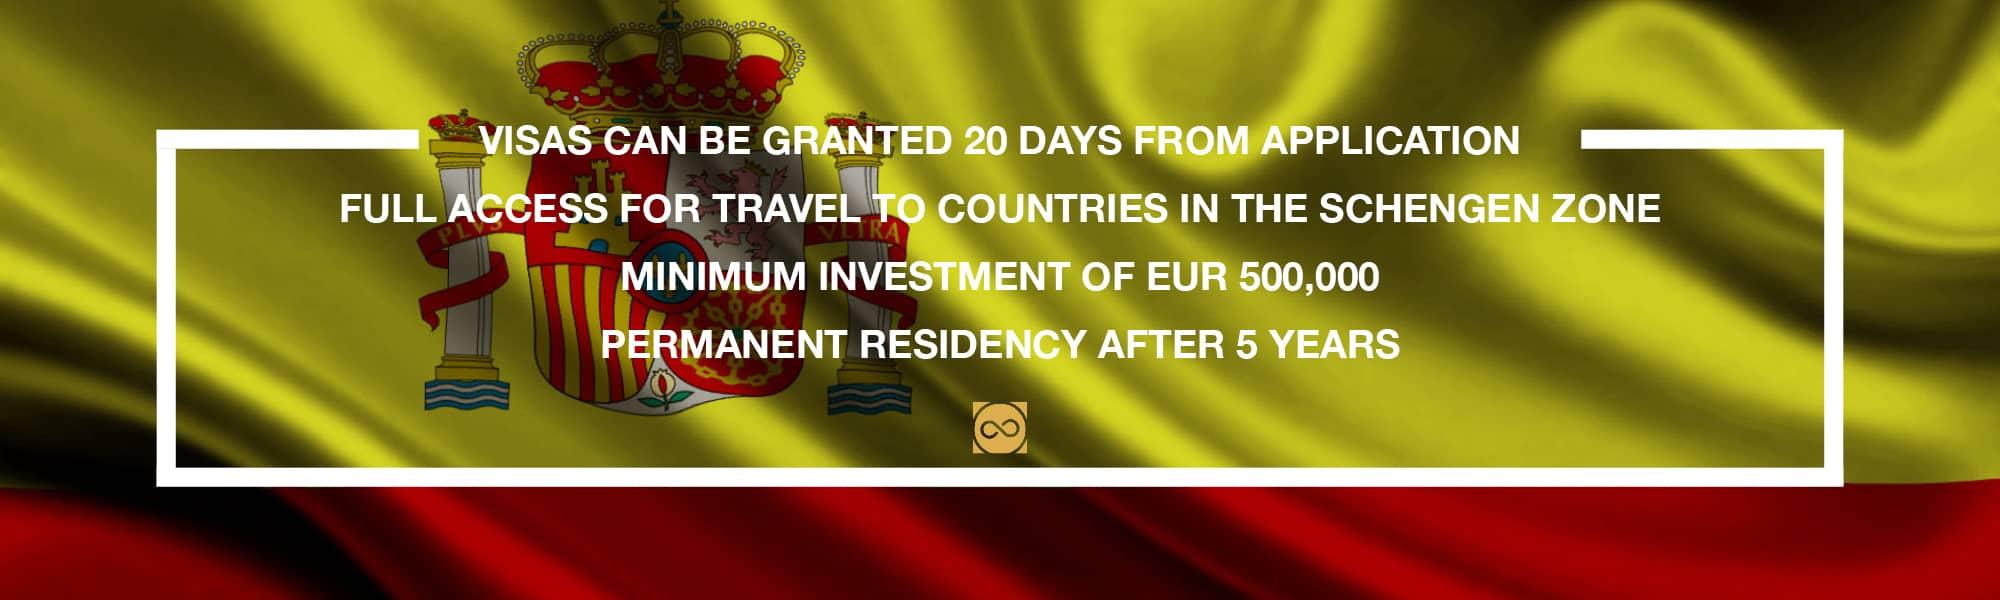 Spain Residency Program